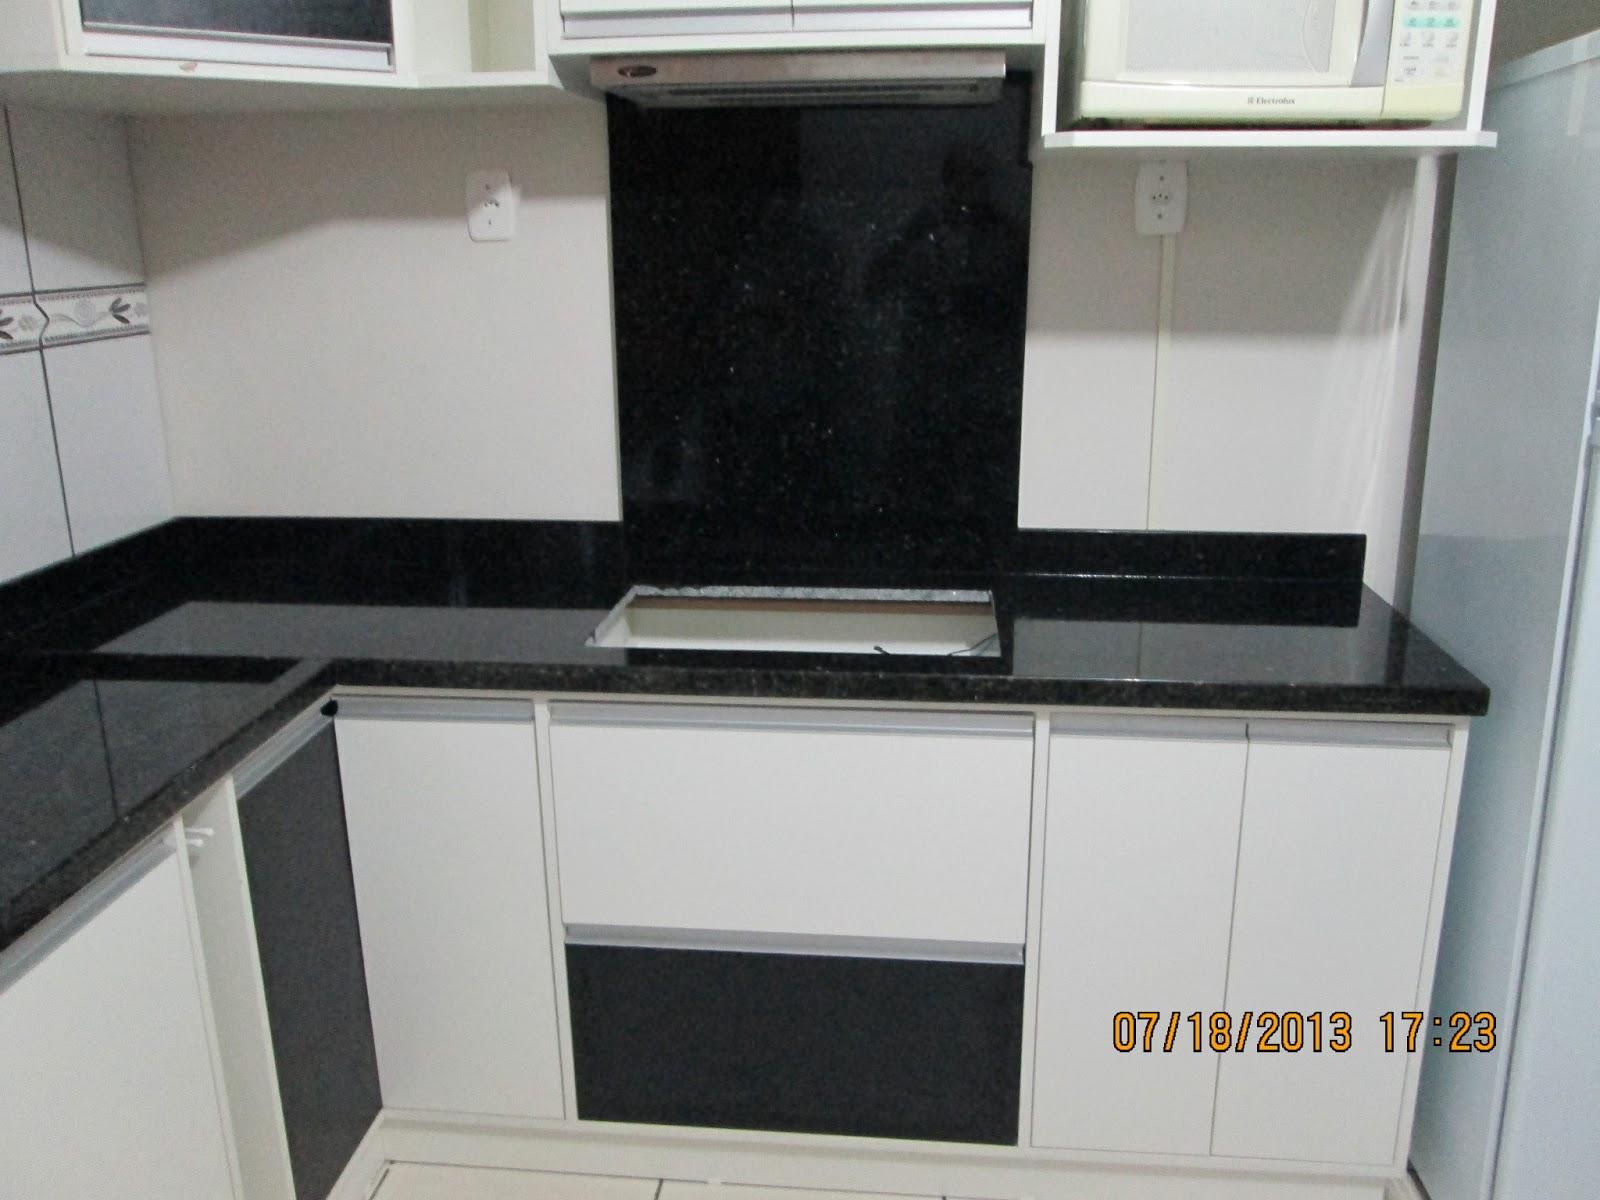 MARMORARIA CARDOZO: Cozinha de Granito Verde Ubatuba #715E40 1600x1200